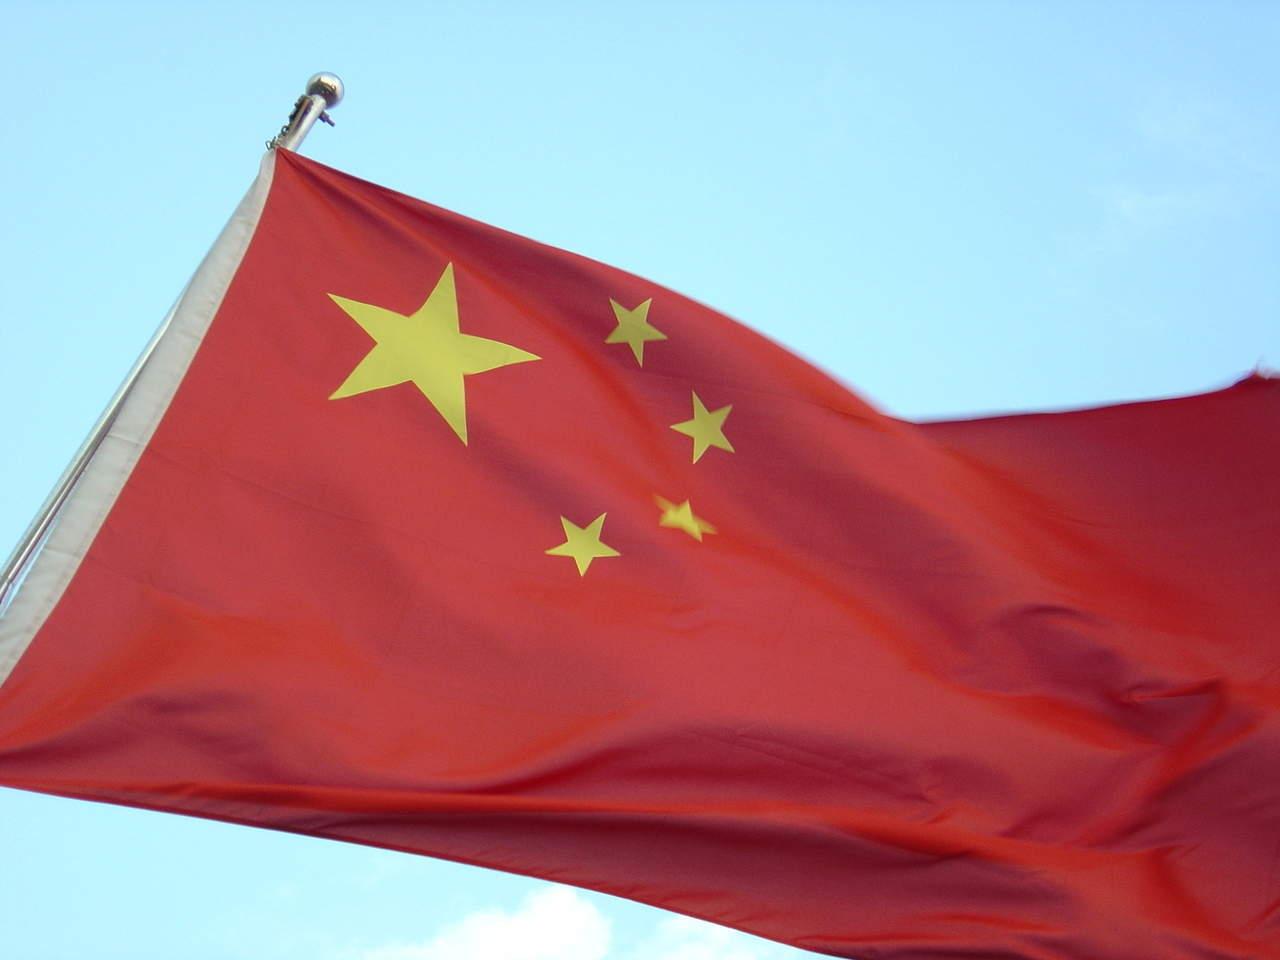 china-flag-1418969-1280x960